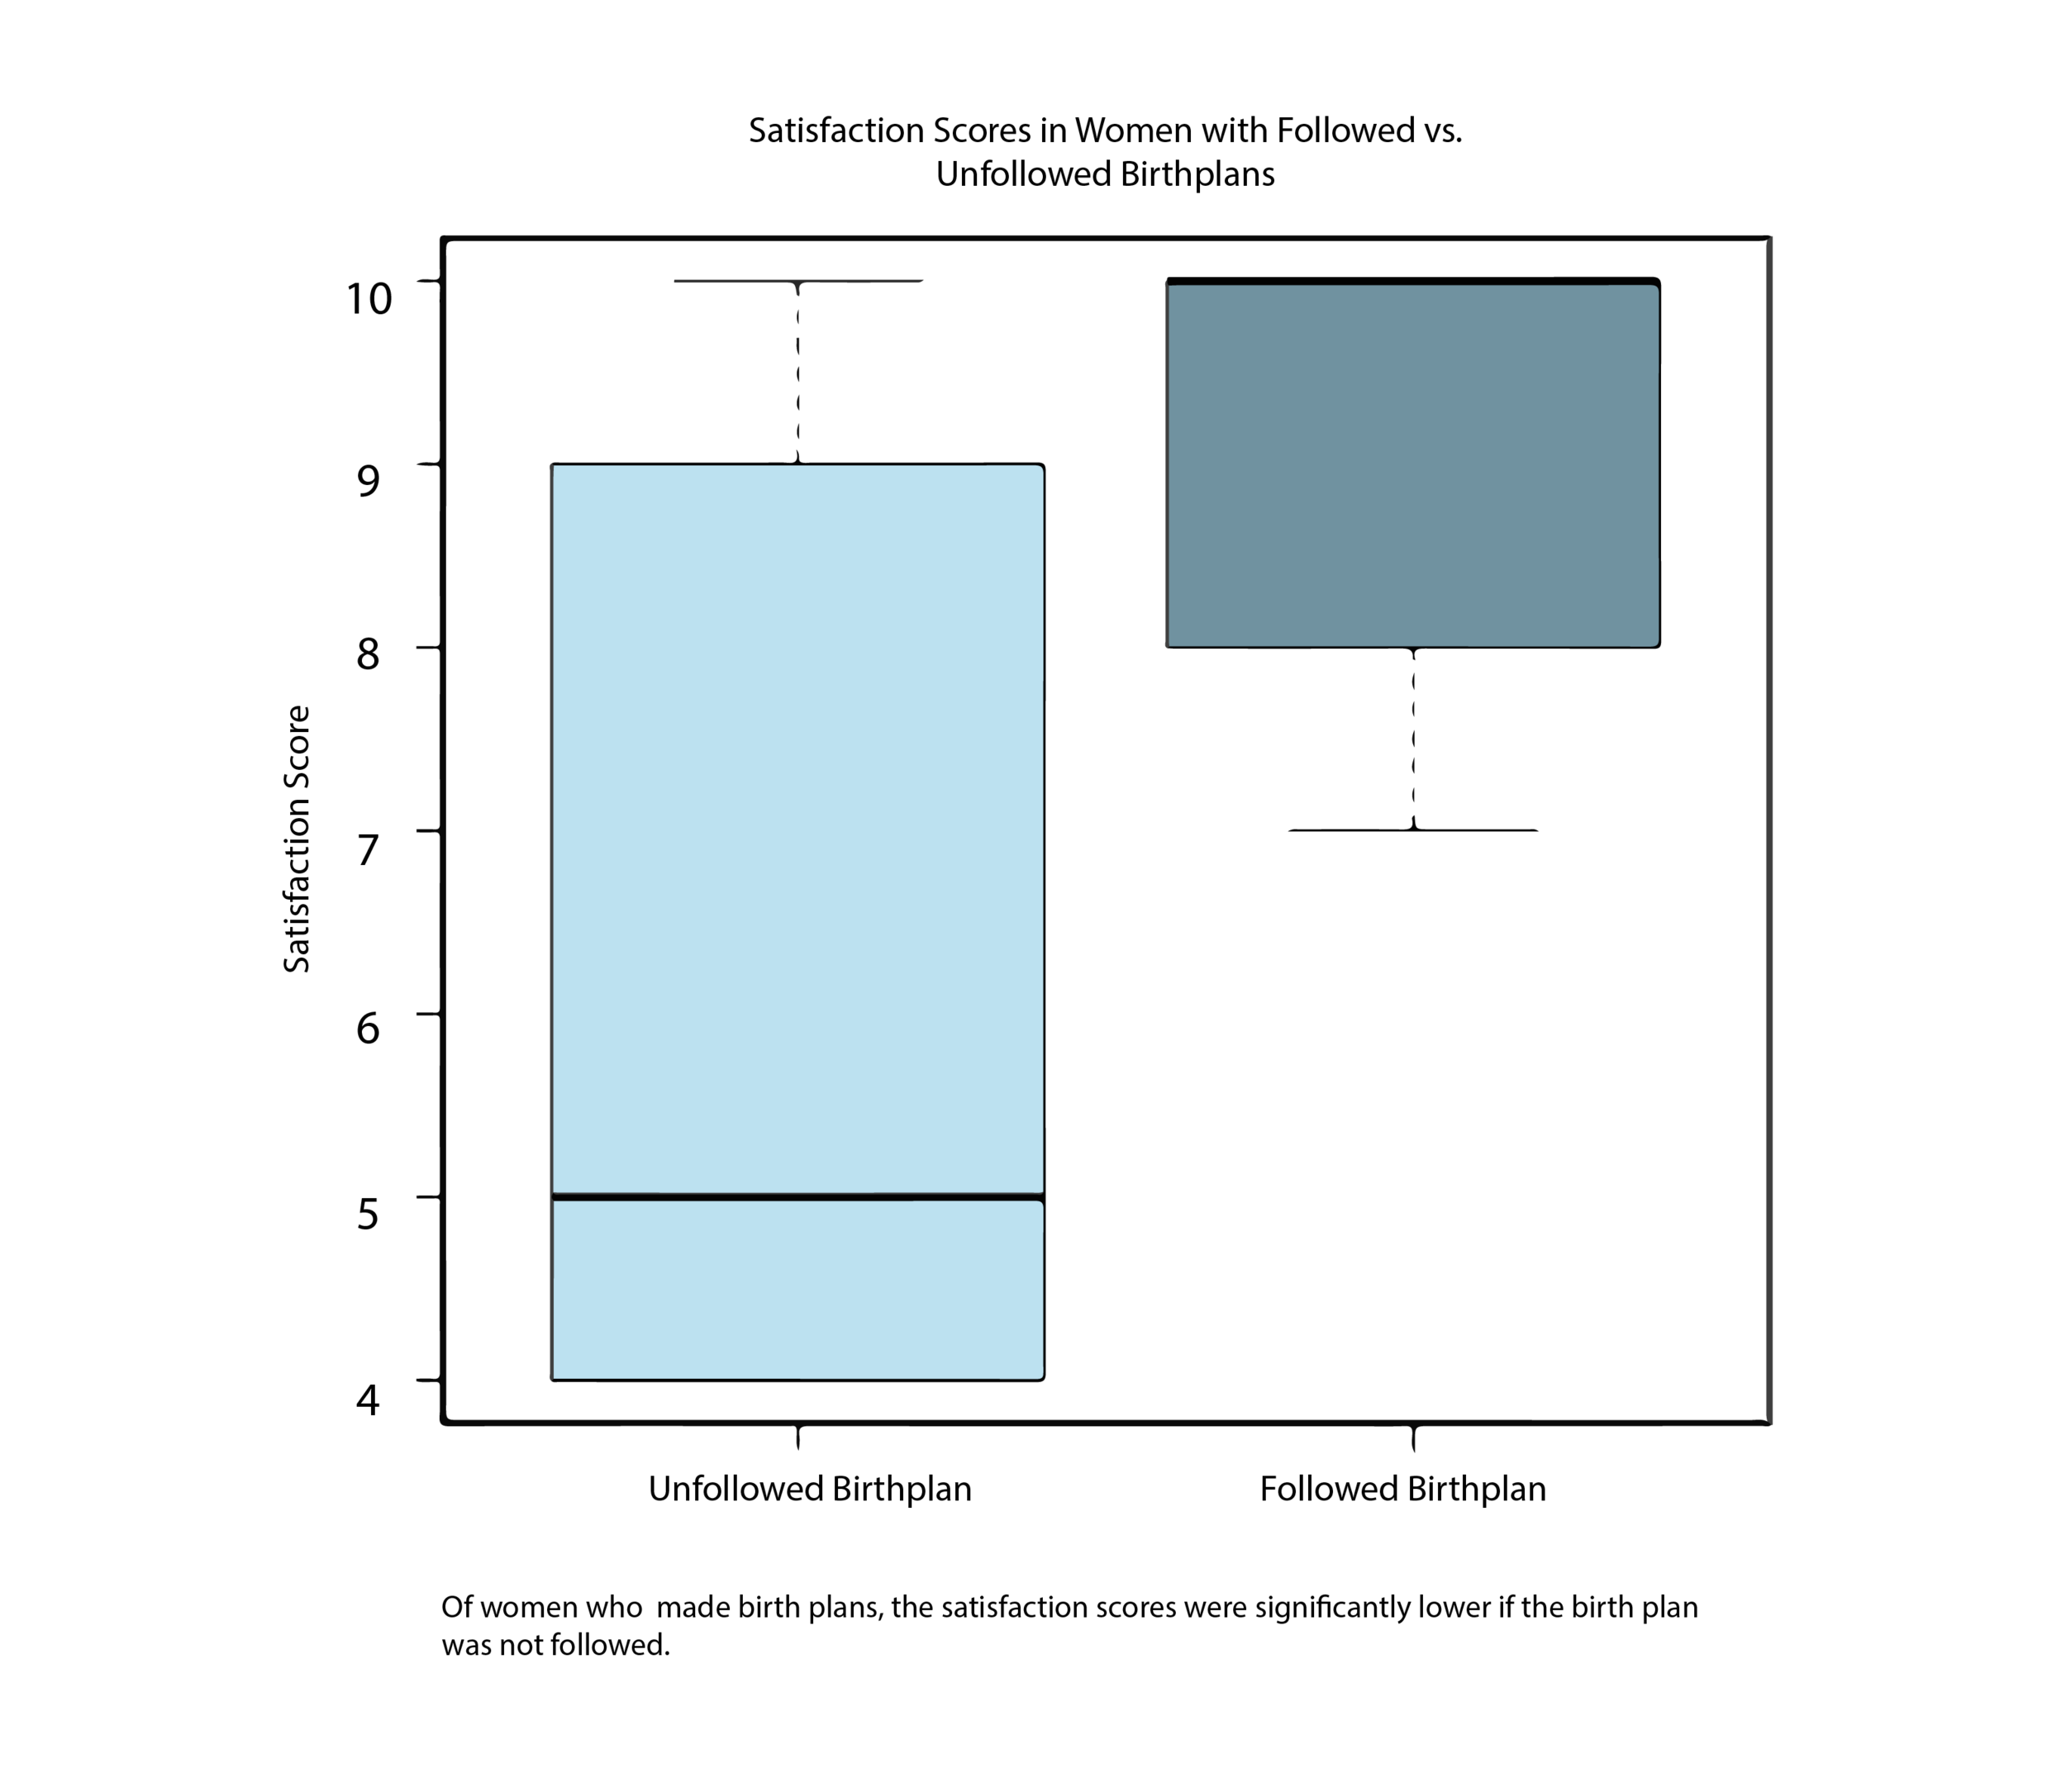 graphArtboard 6@4x.png